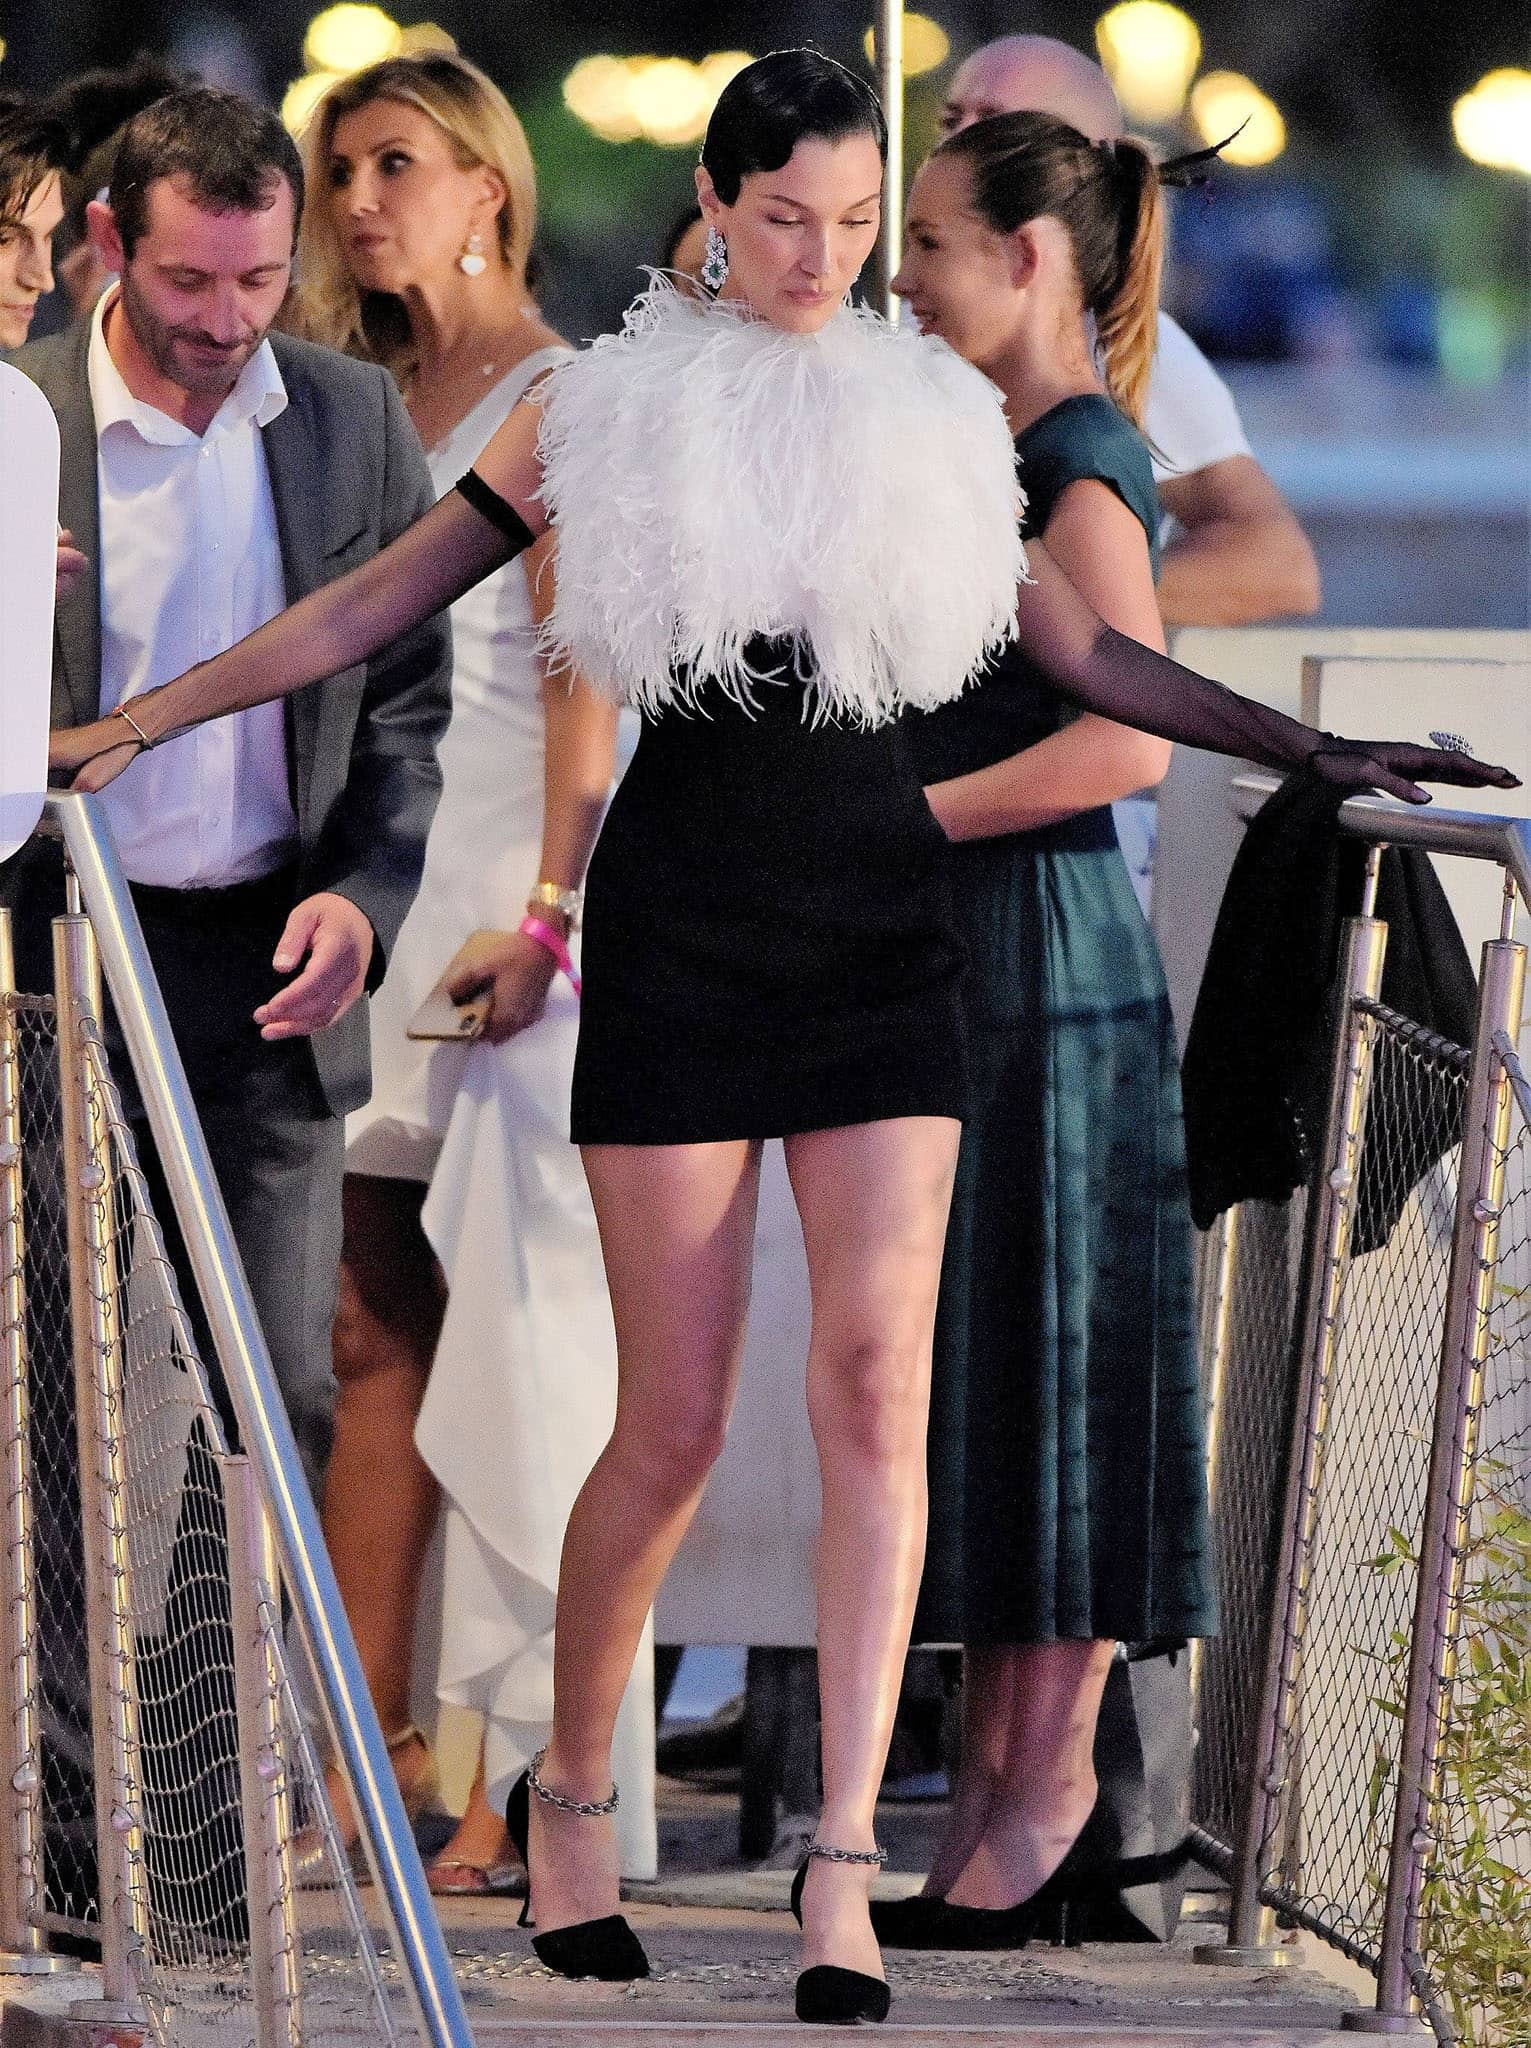 Bella Hadid stuns in her '80s-style Lanvin feathered mini dress